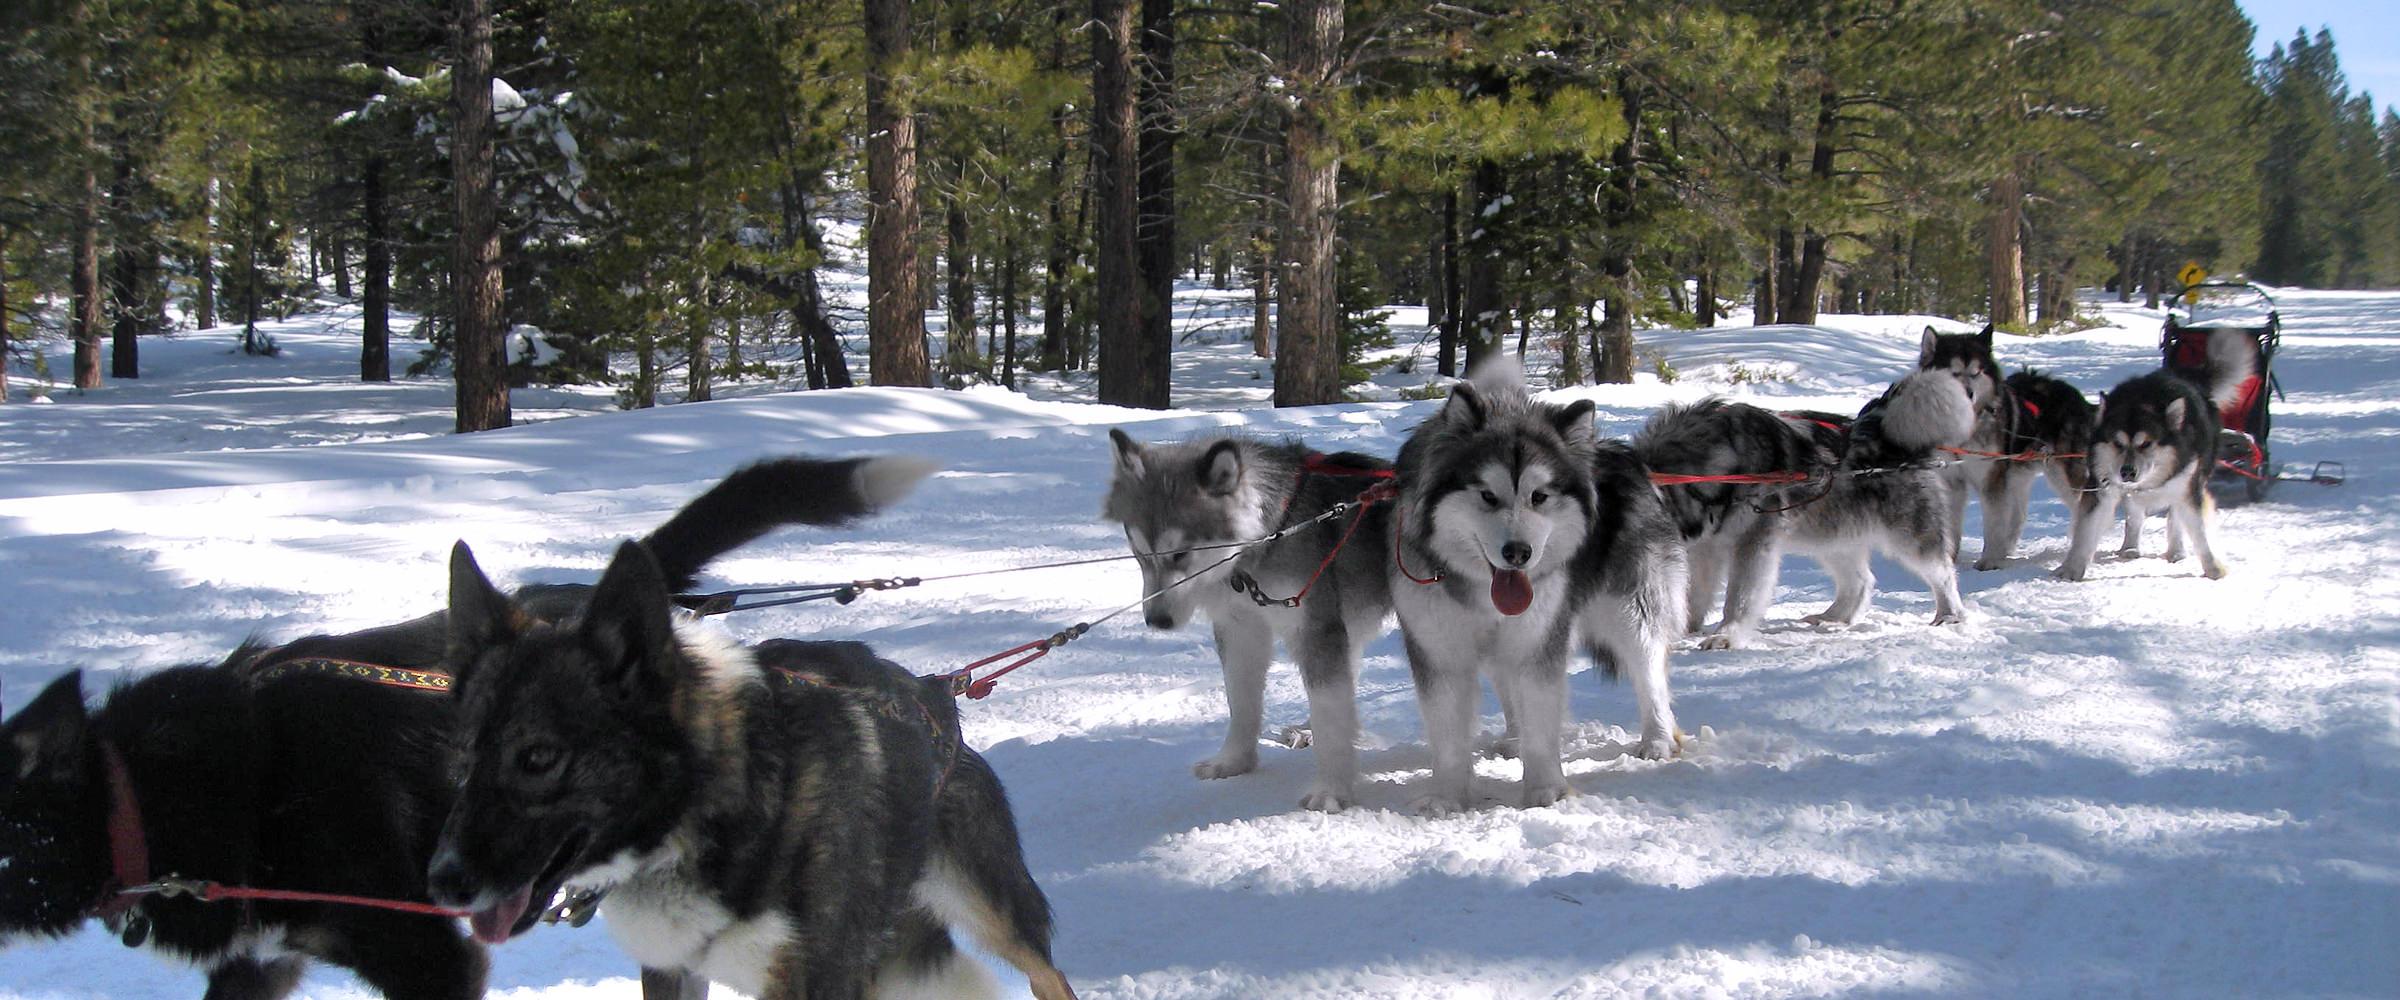 Snowlion Alaskan Malamutes Sledding